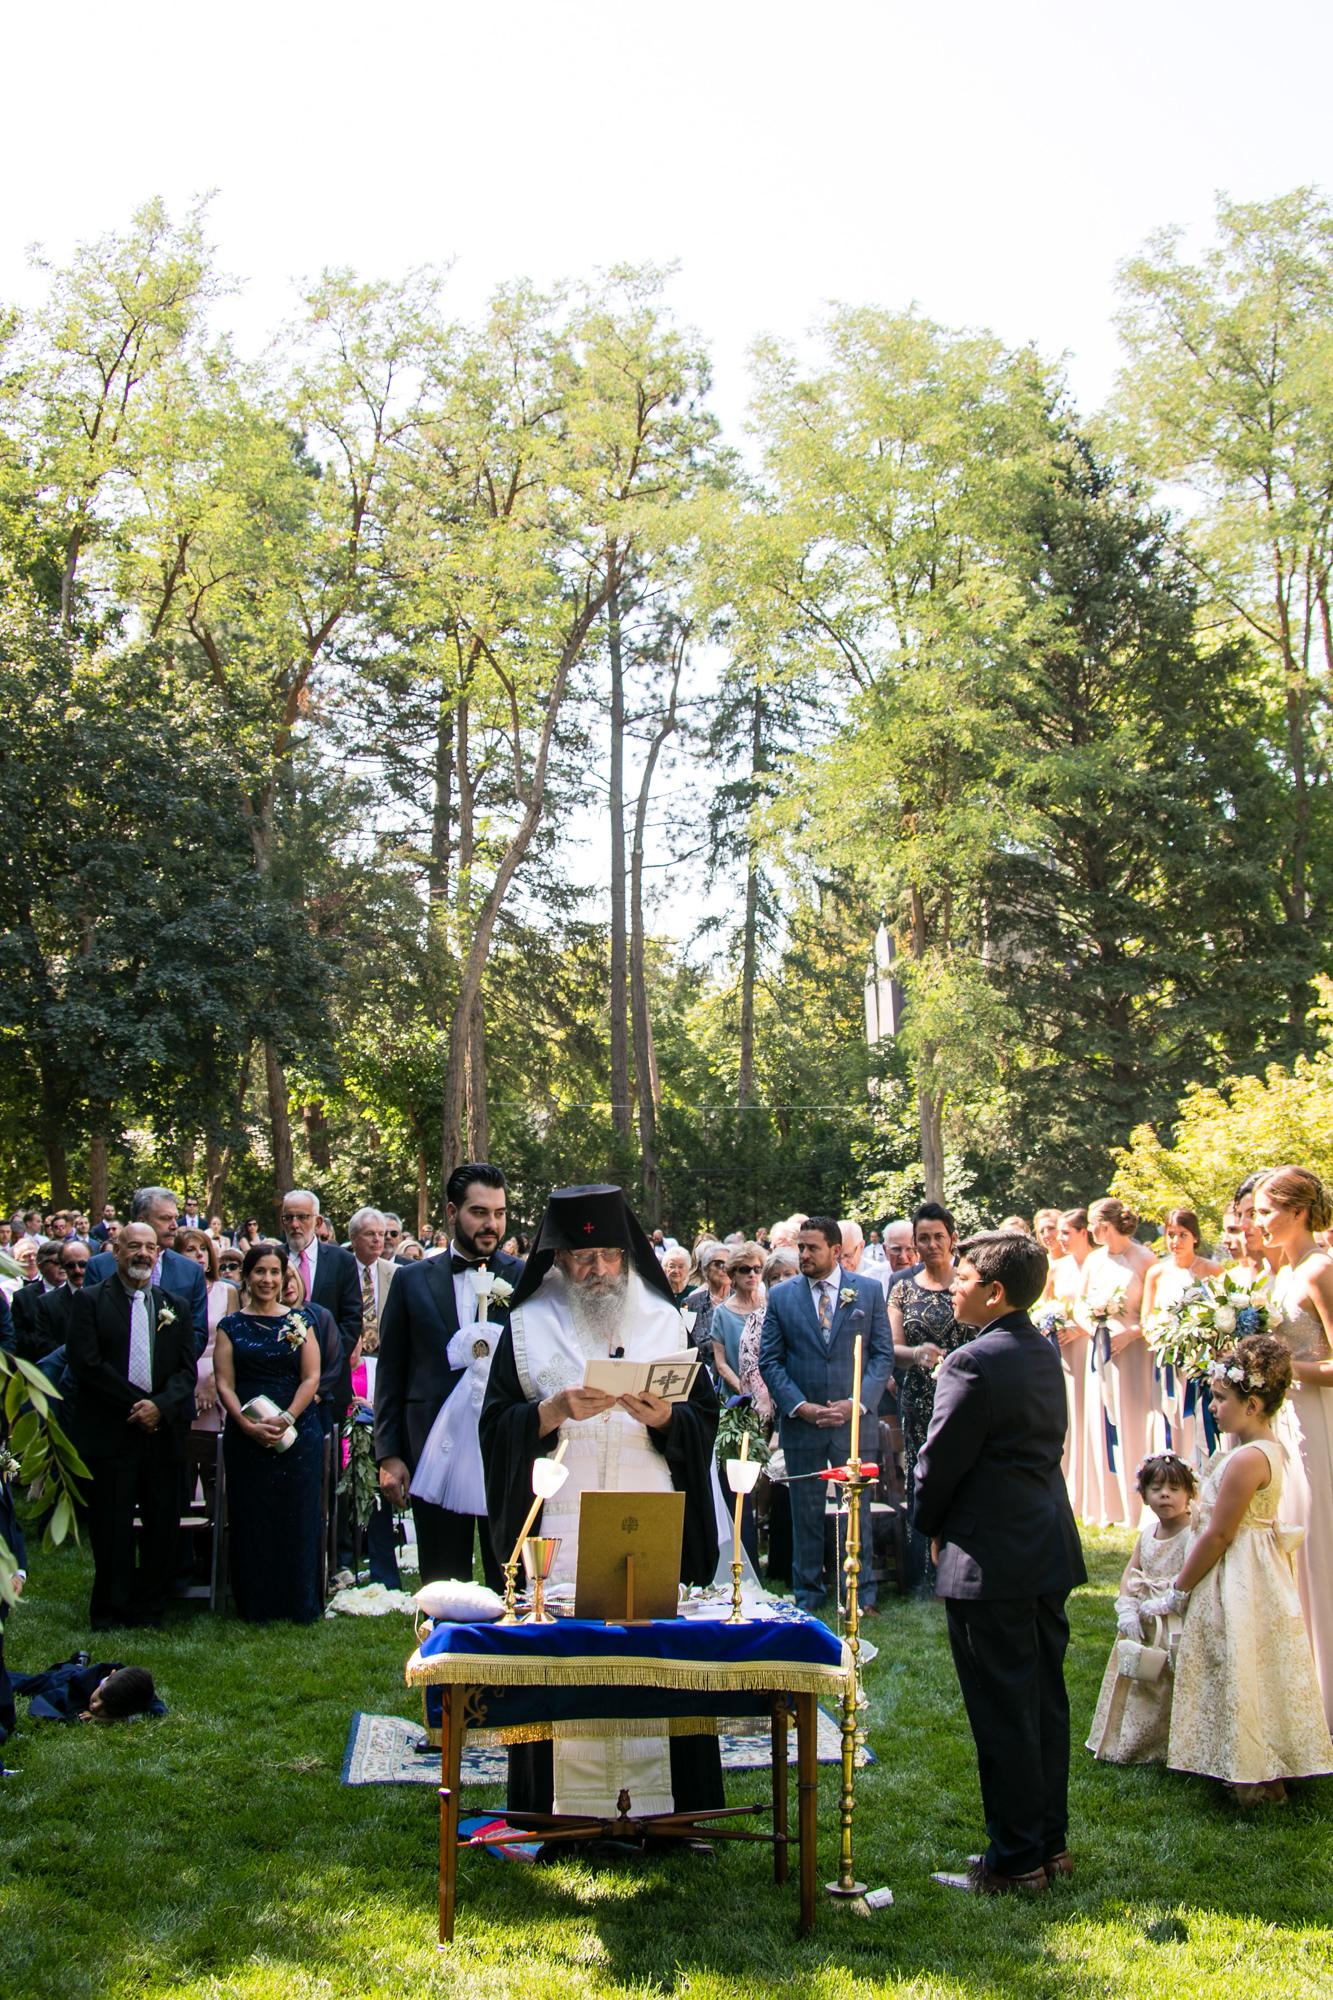 greek-wedding-salt-lake-city-utah-18.jpg